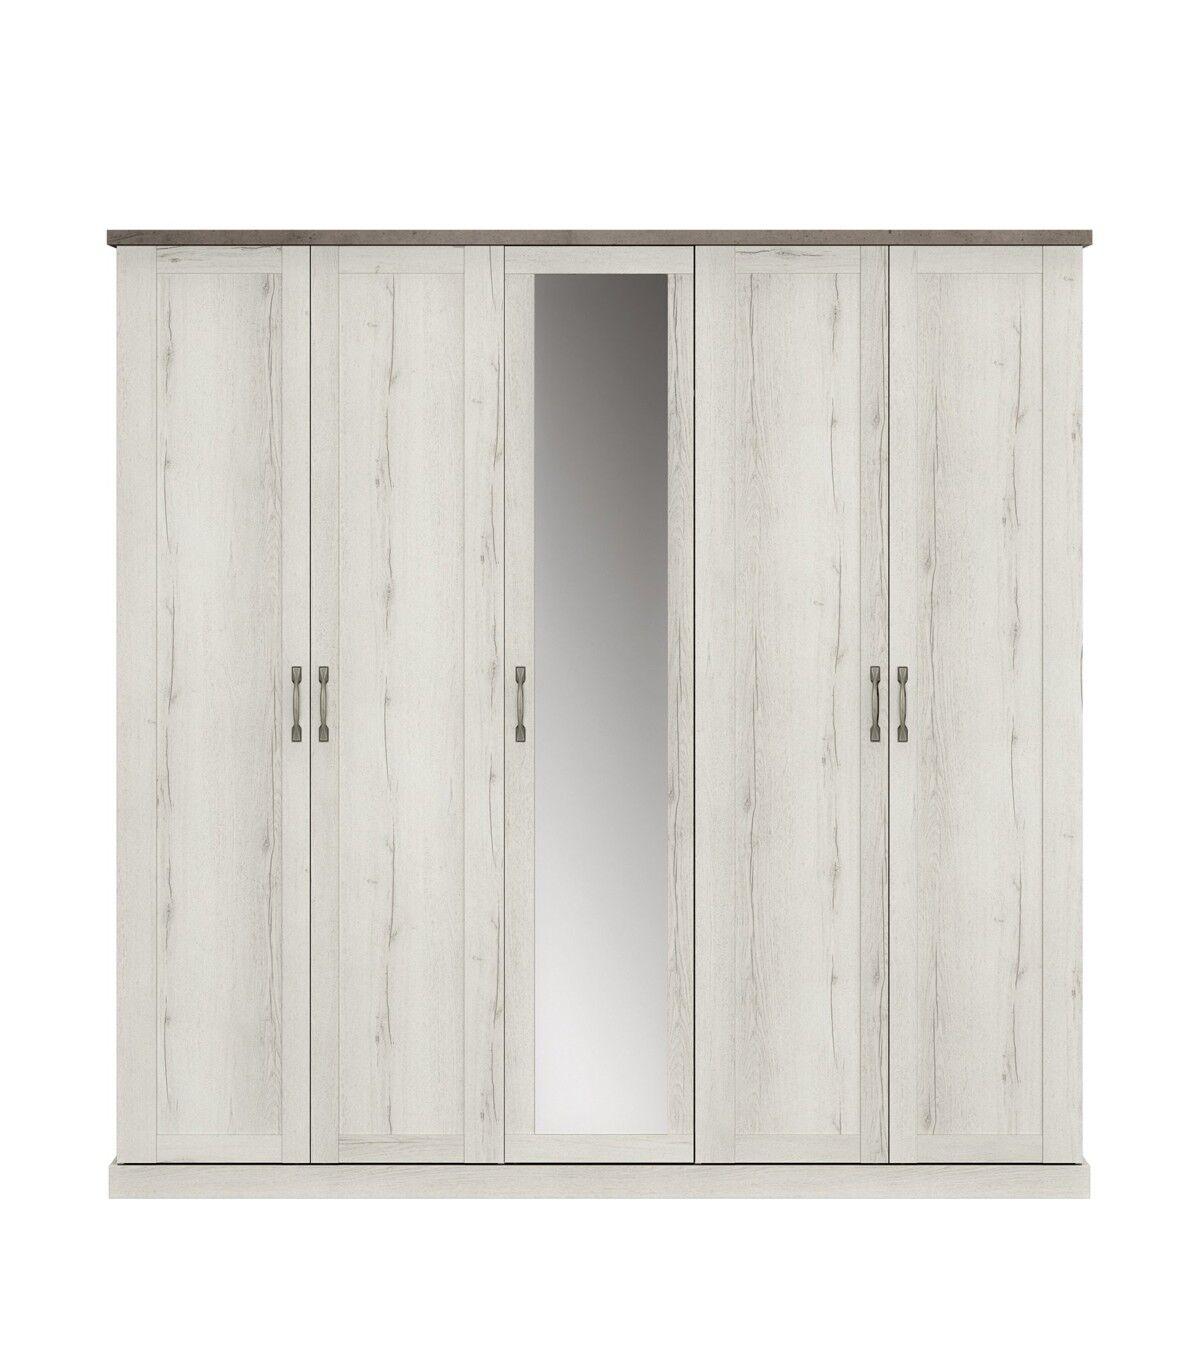 Calicosy Armoire 5 portes avec miroir - Décor Chne blanchi